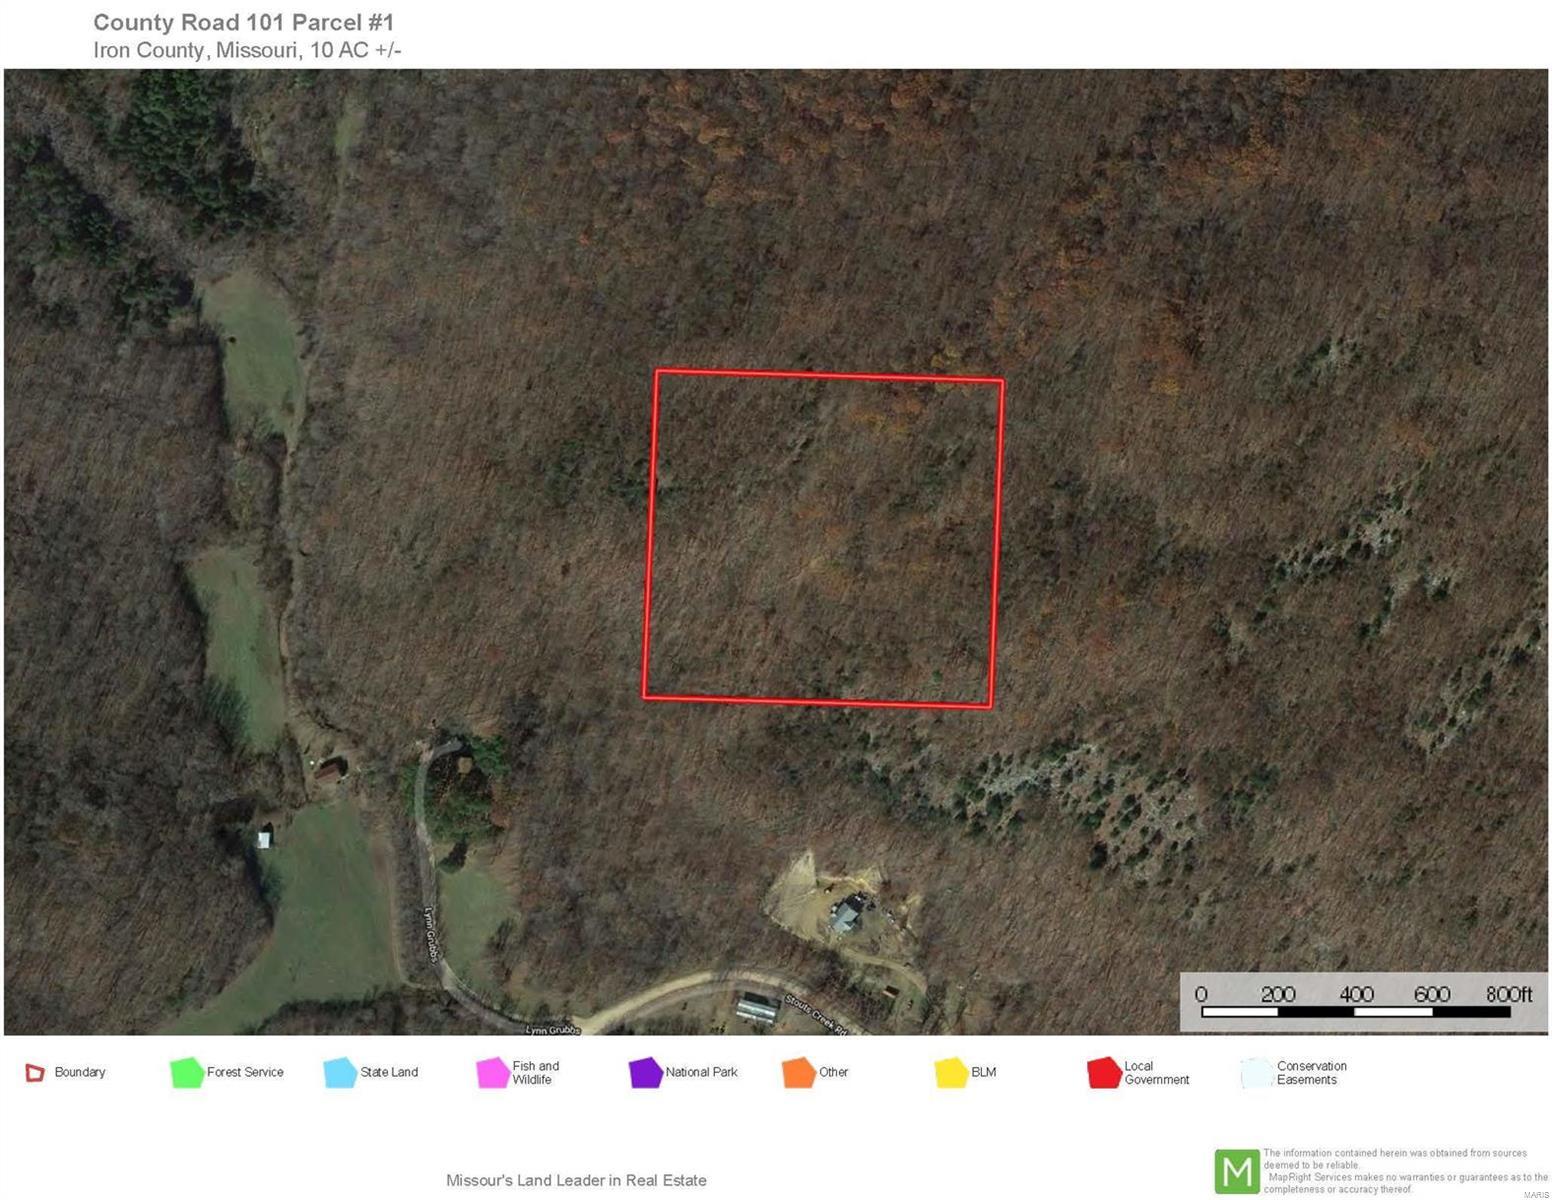 0 Co Rd 101 Property Photo - Ironton, MO real estate listing